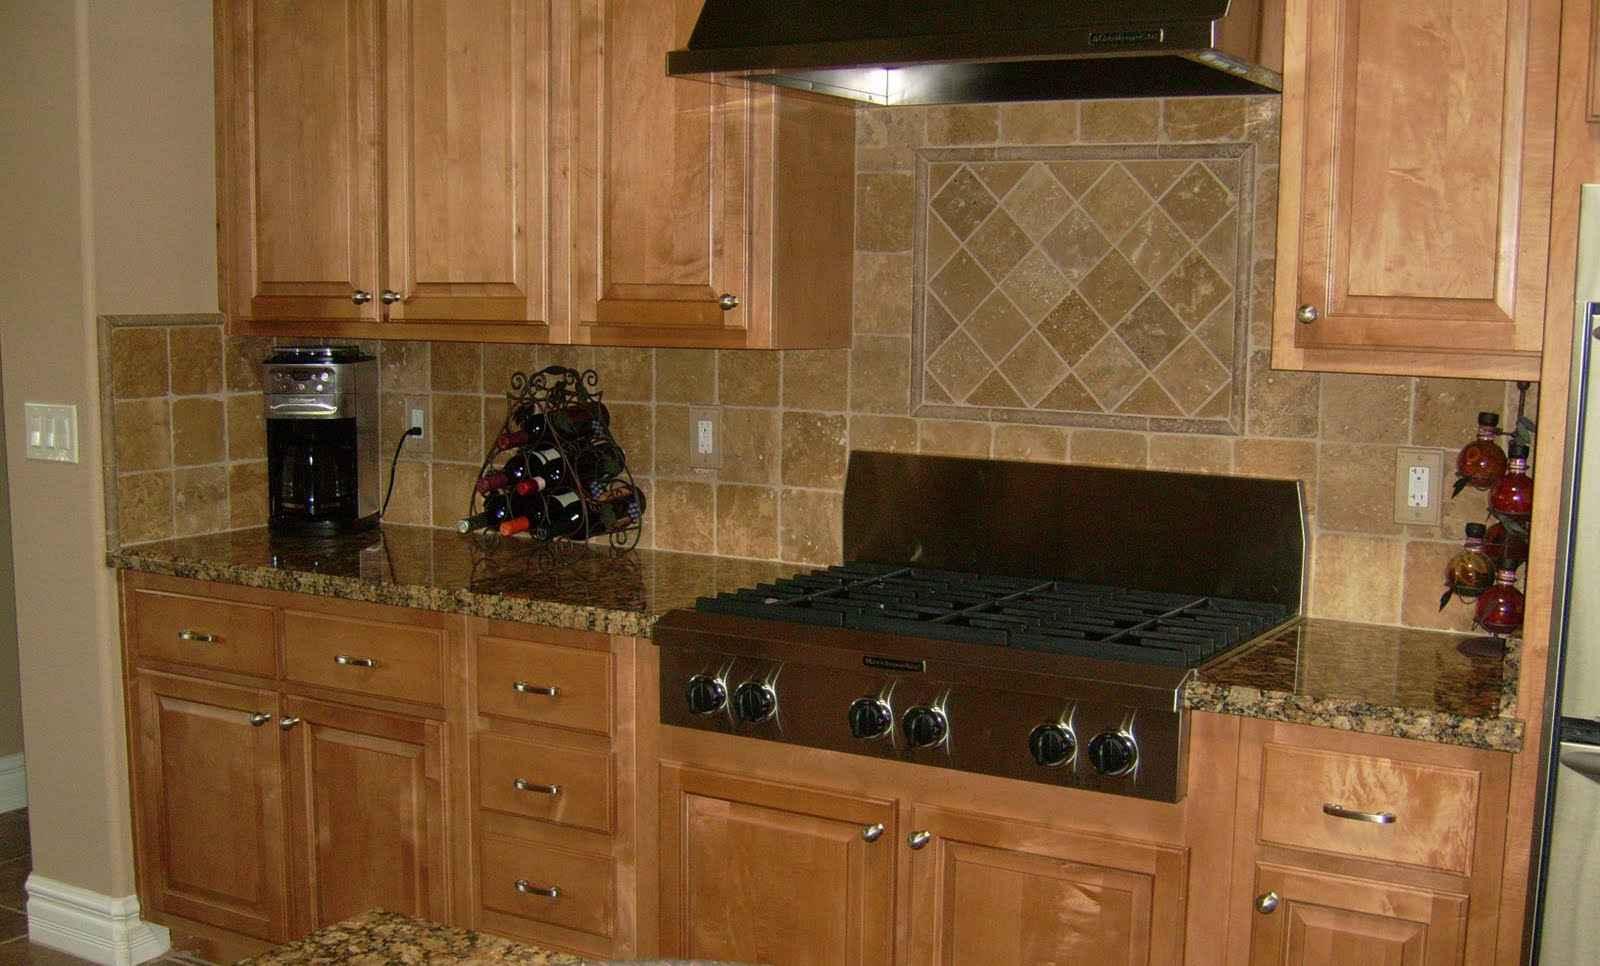 inexpensive backsplashes for kitchens moen pull out kitchen faucet cheap backsplash ideas modern